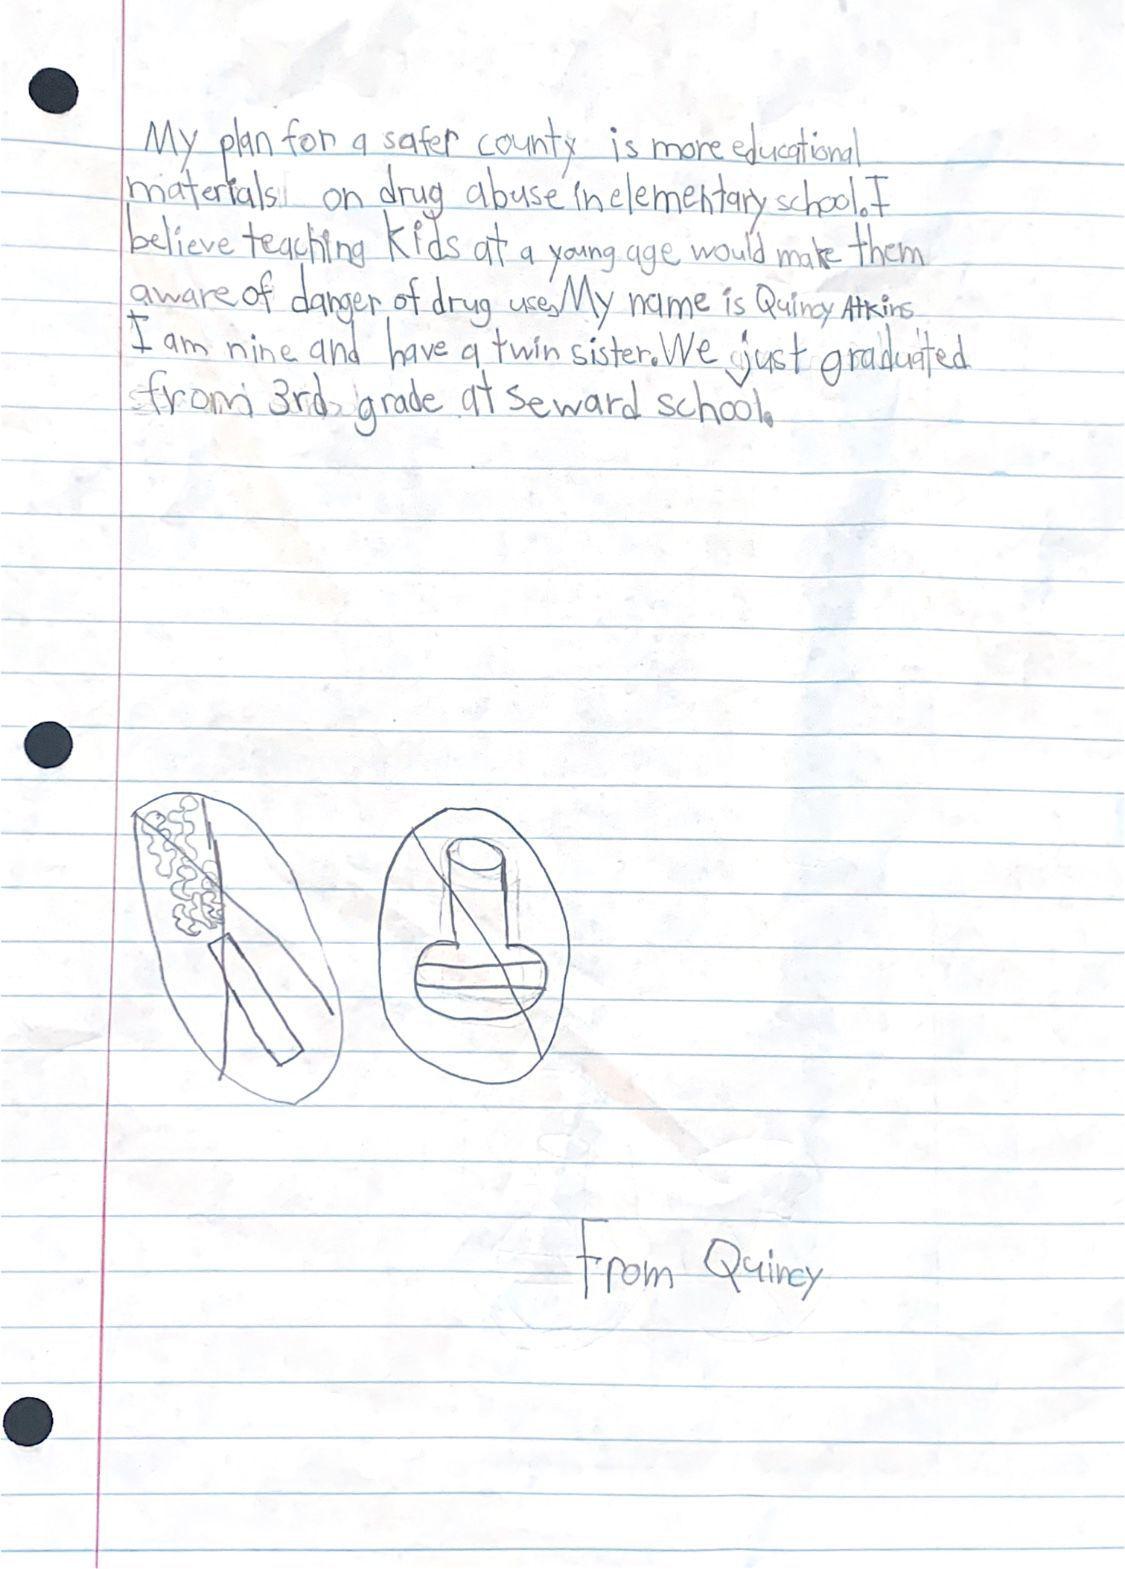 Quincy Atkins essay